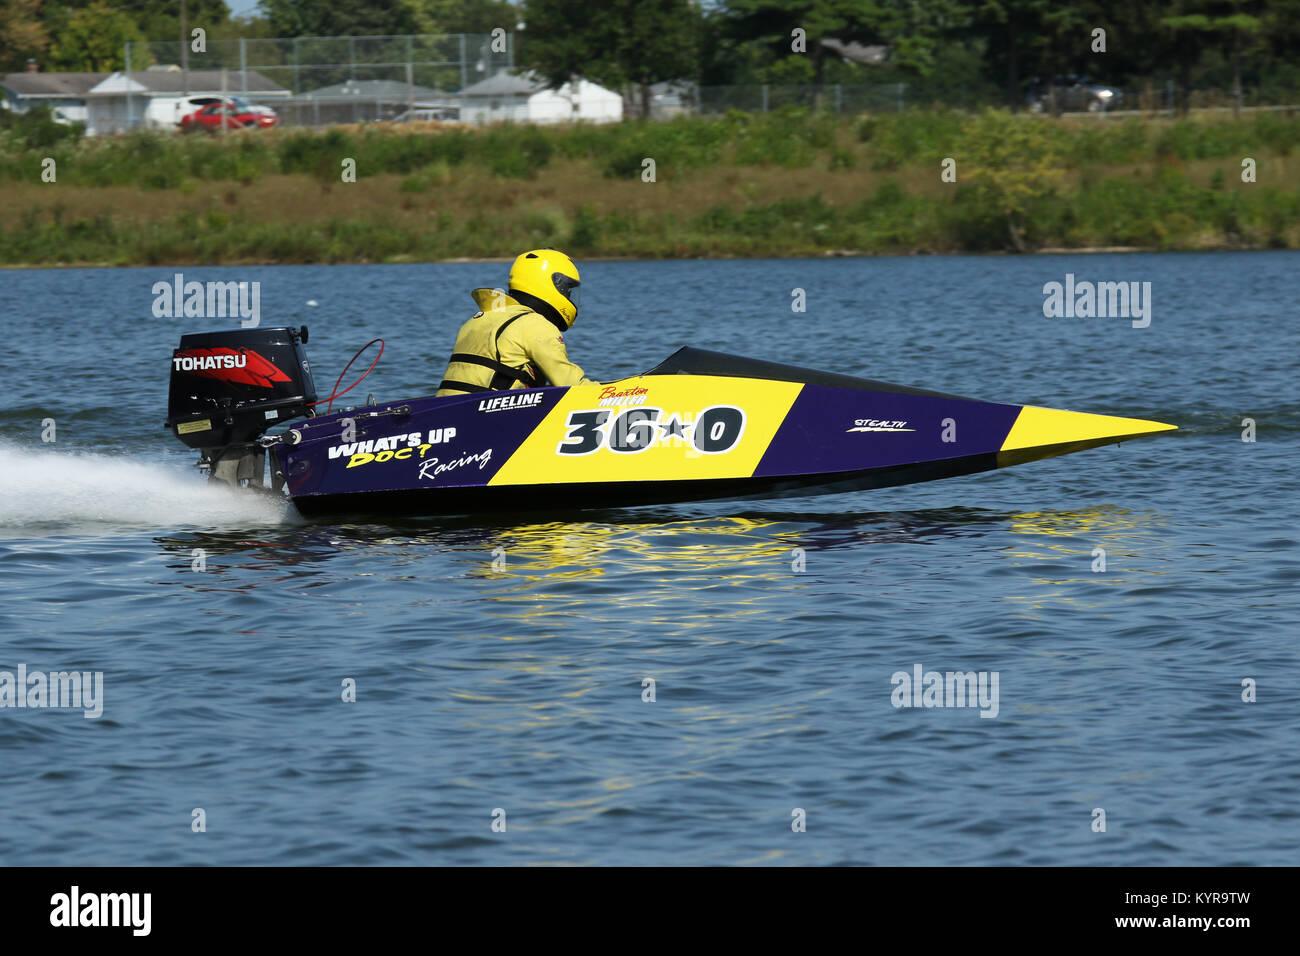 Braxton Miller in Boat 36O. Outboard Hydroplane boat races. Dayton Record  Runs Regatta. Eastwood Lake, Dayton, Ohio, USA.